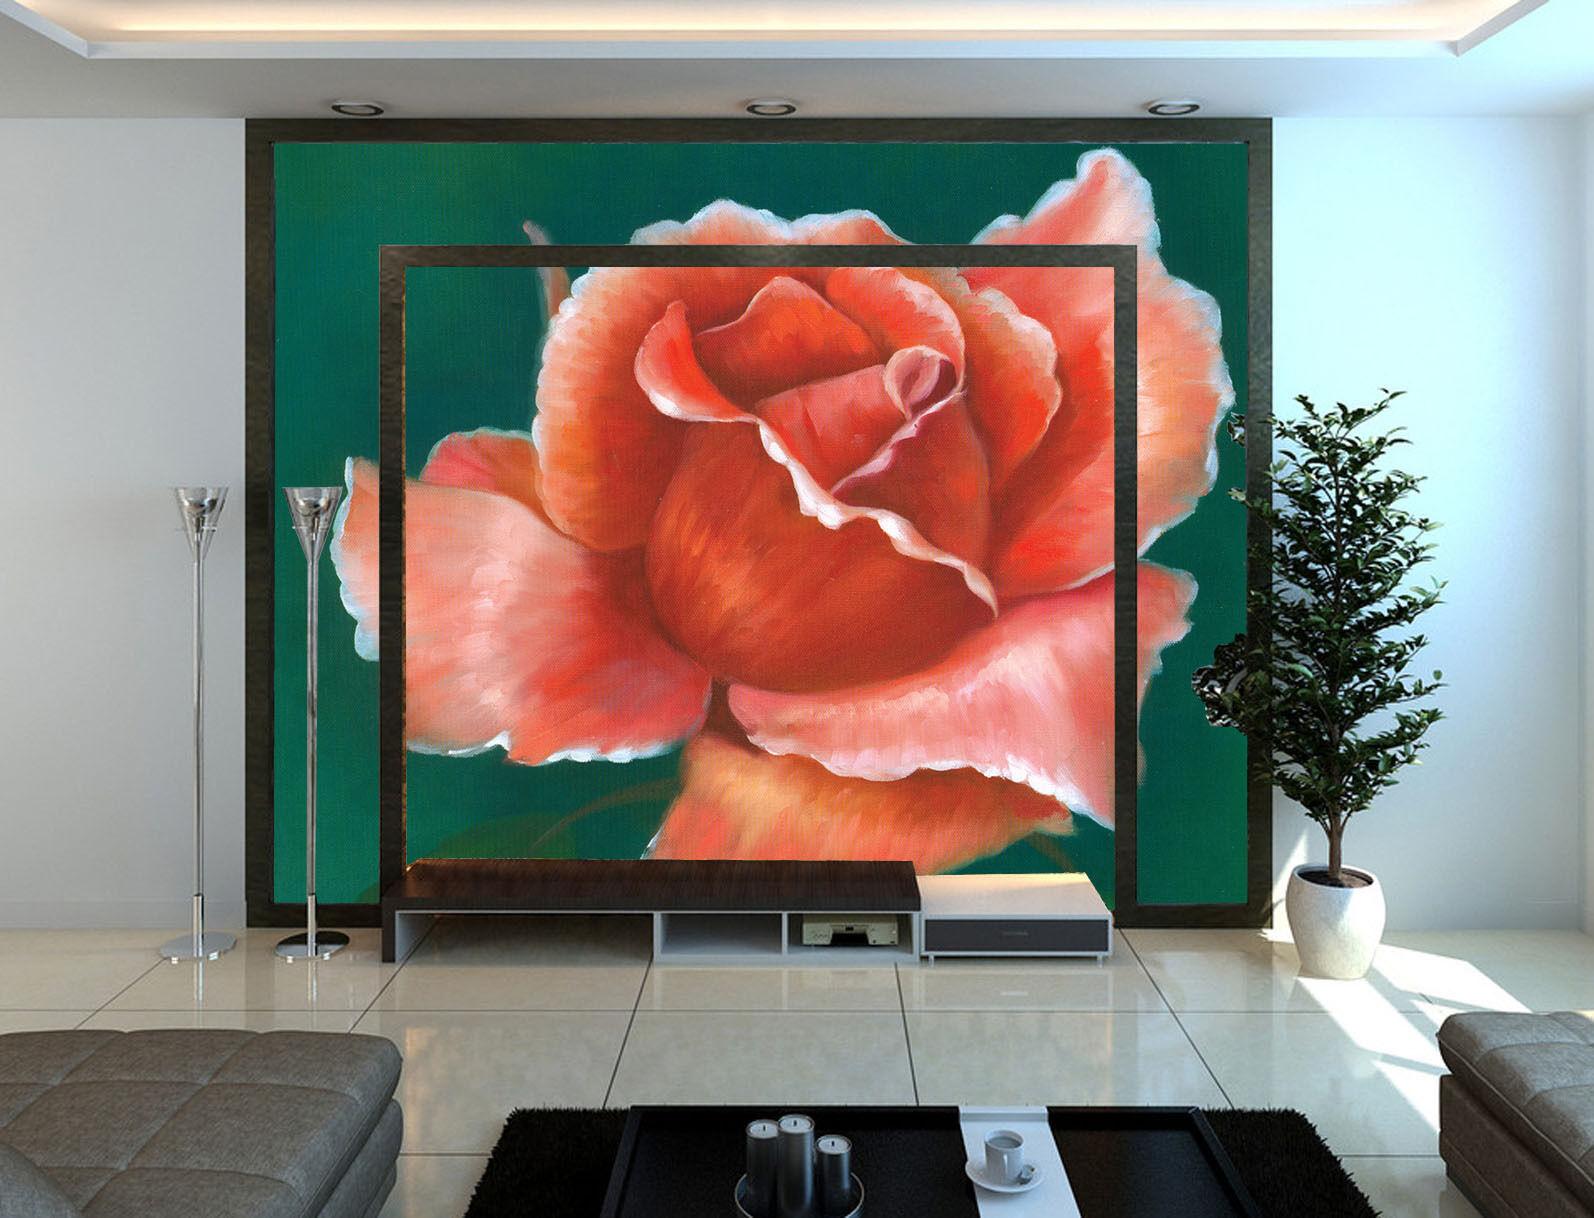 3D Die angehende Rose 6676 Fototapeten Wandbild Fototapete BildTapete Familie DE